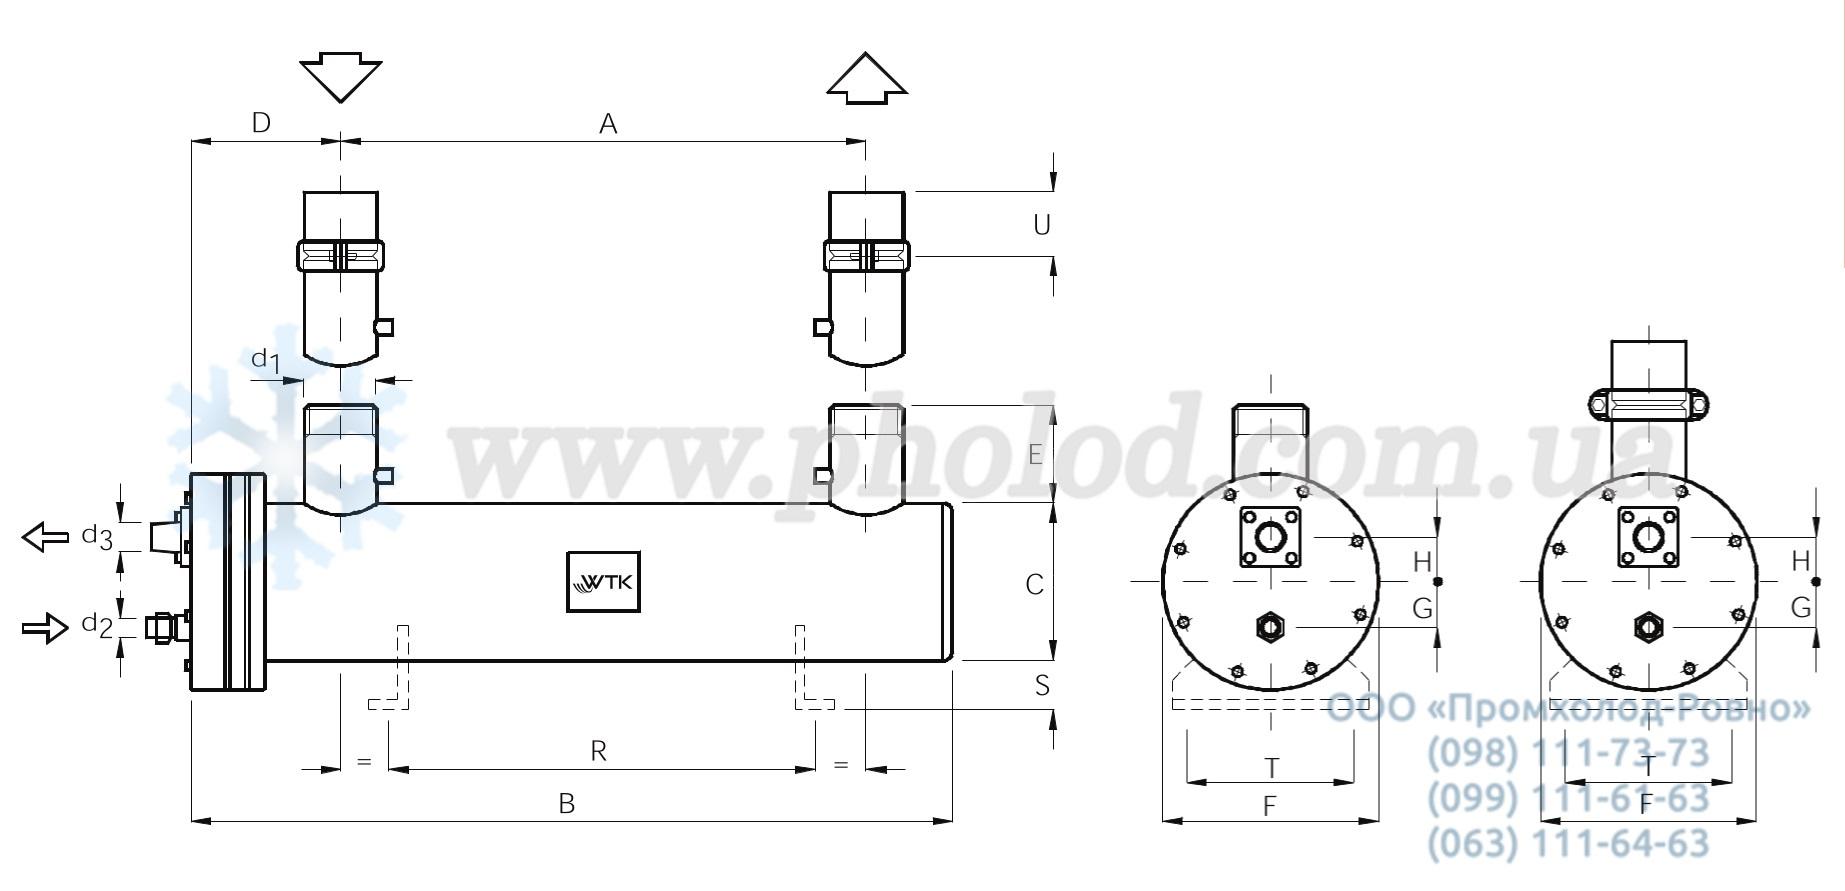 Теплообменник wtk sce 133 ca инструкция теплообменник бытовые регенеративные